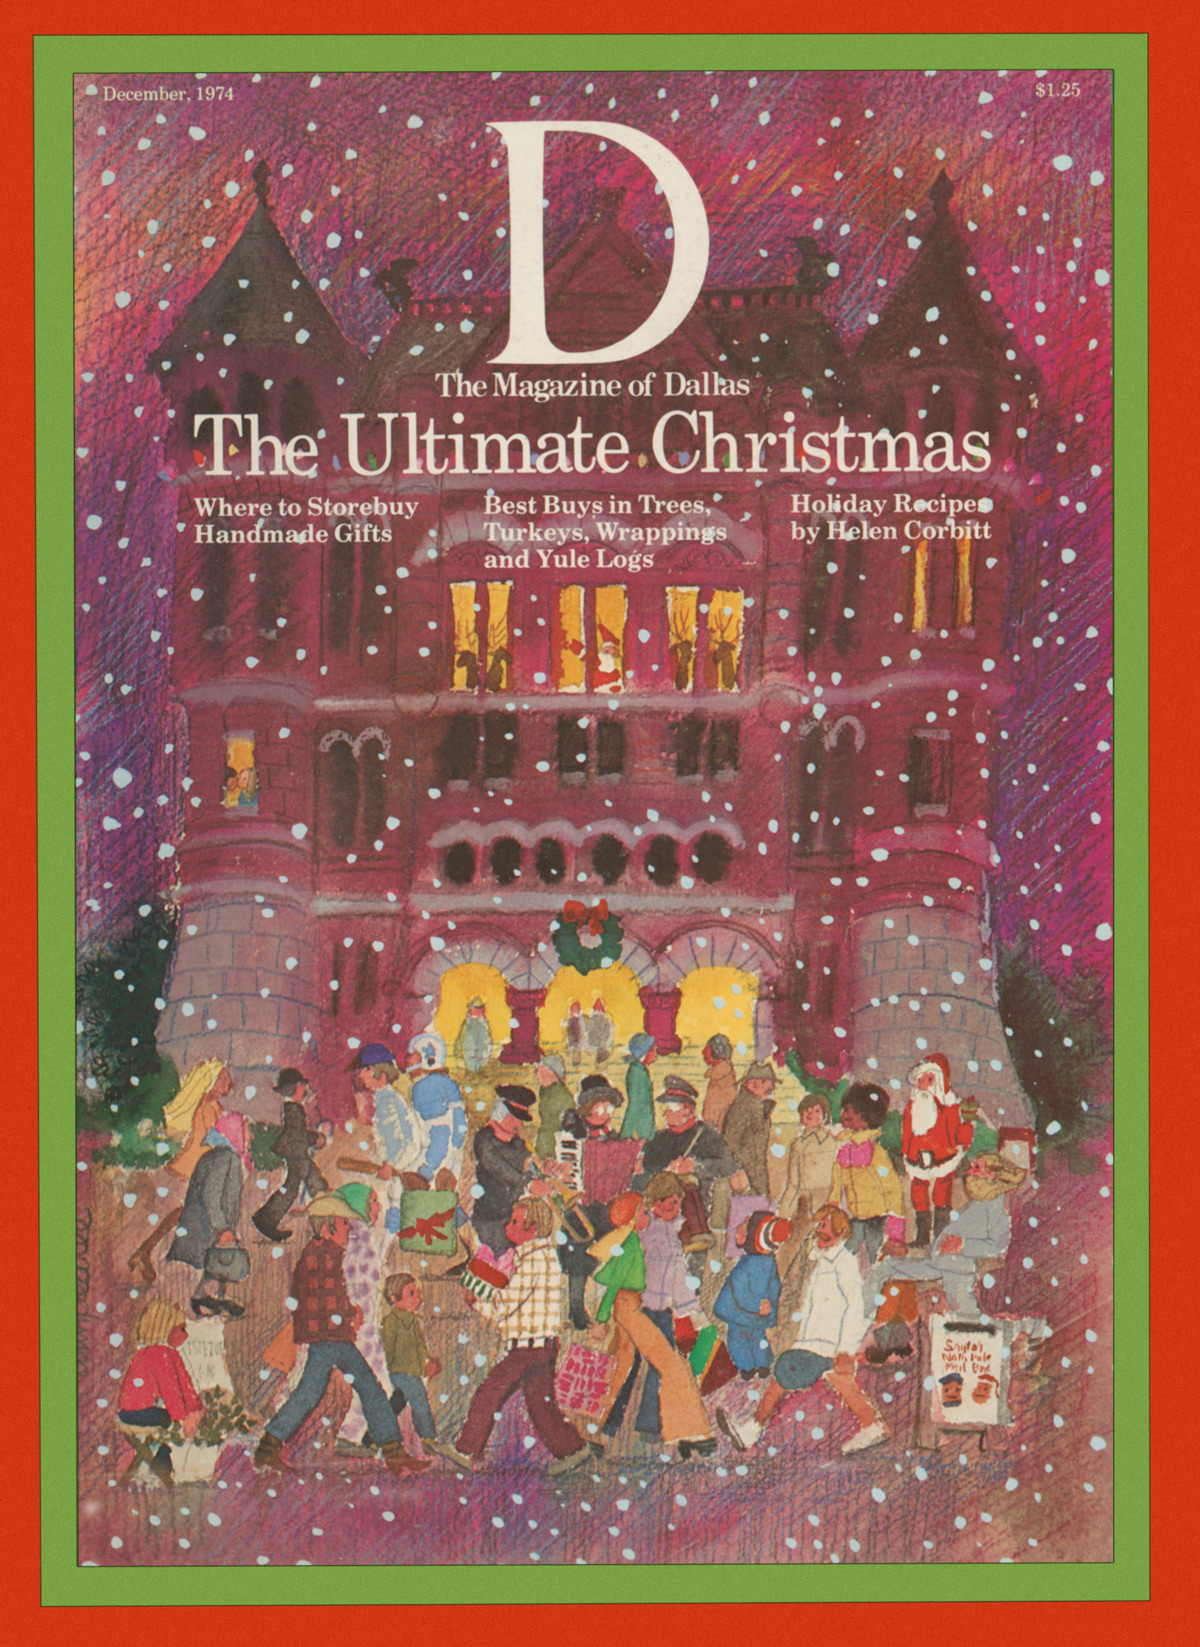 December 1974 cover